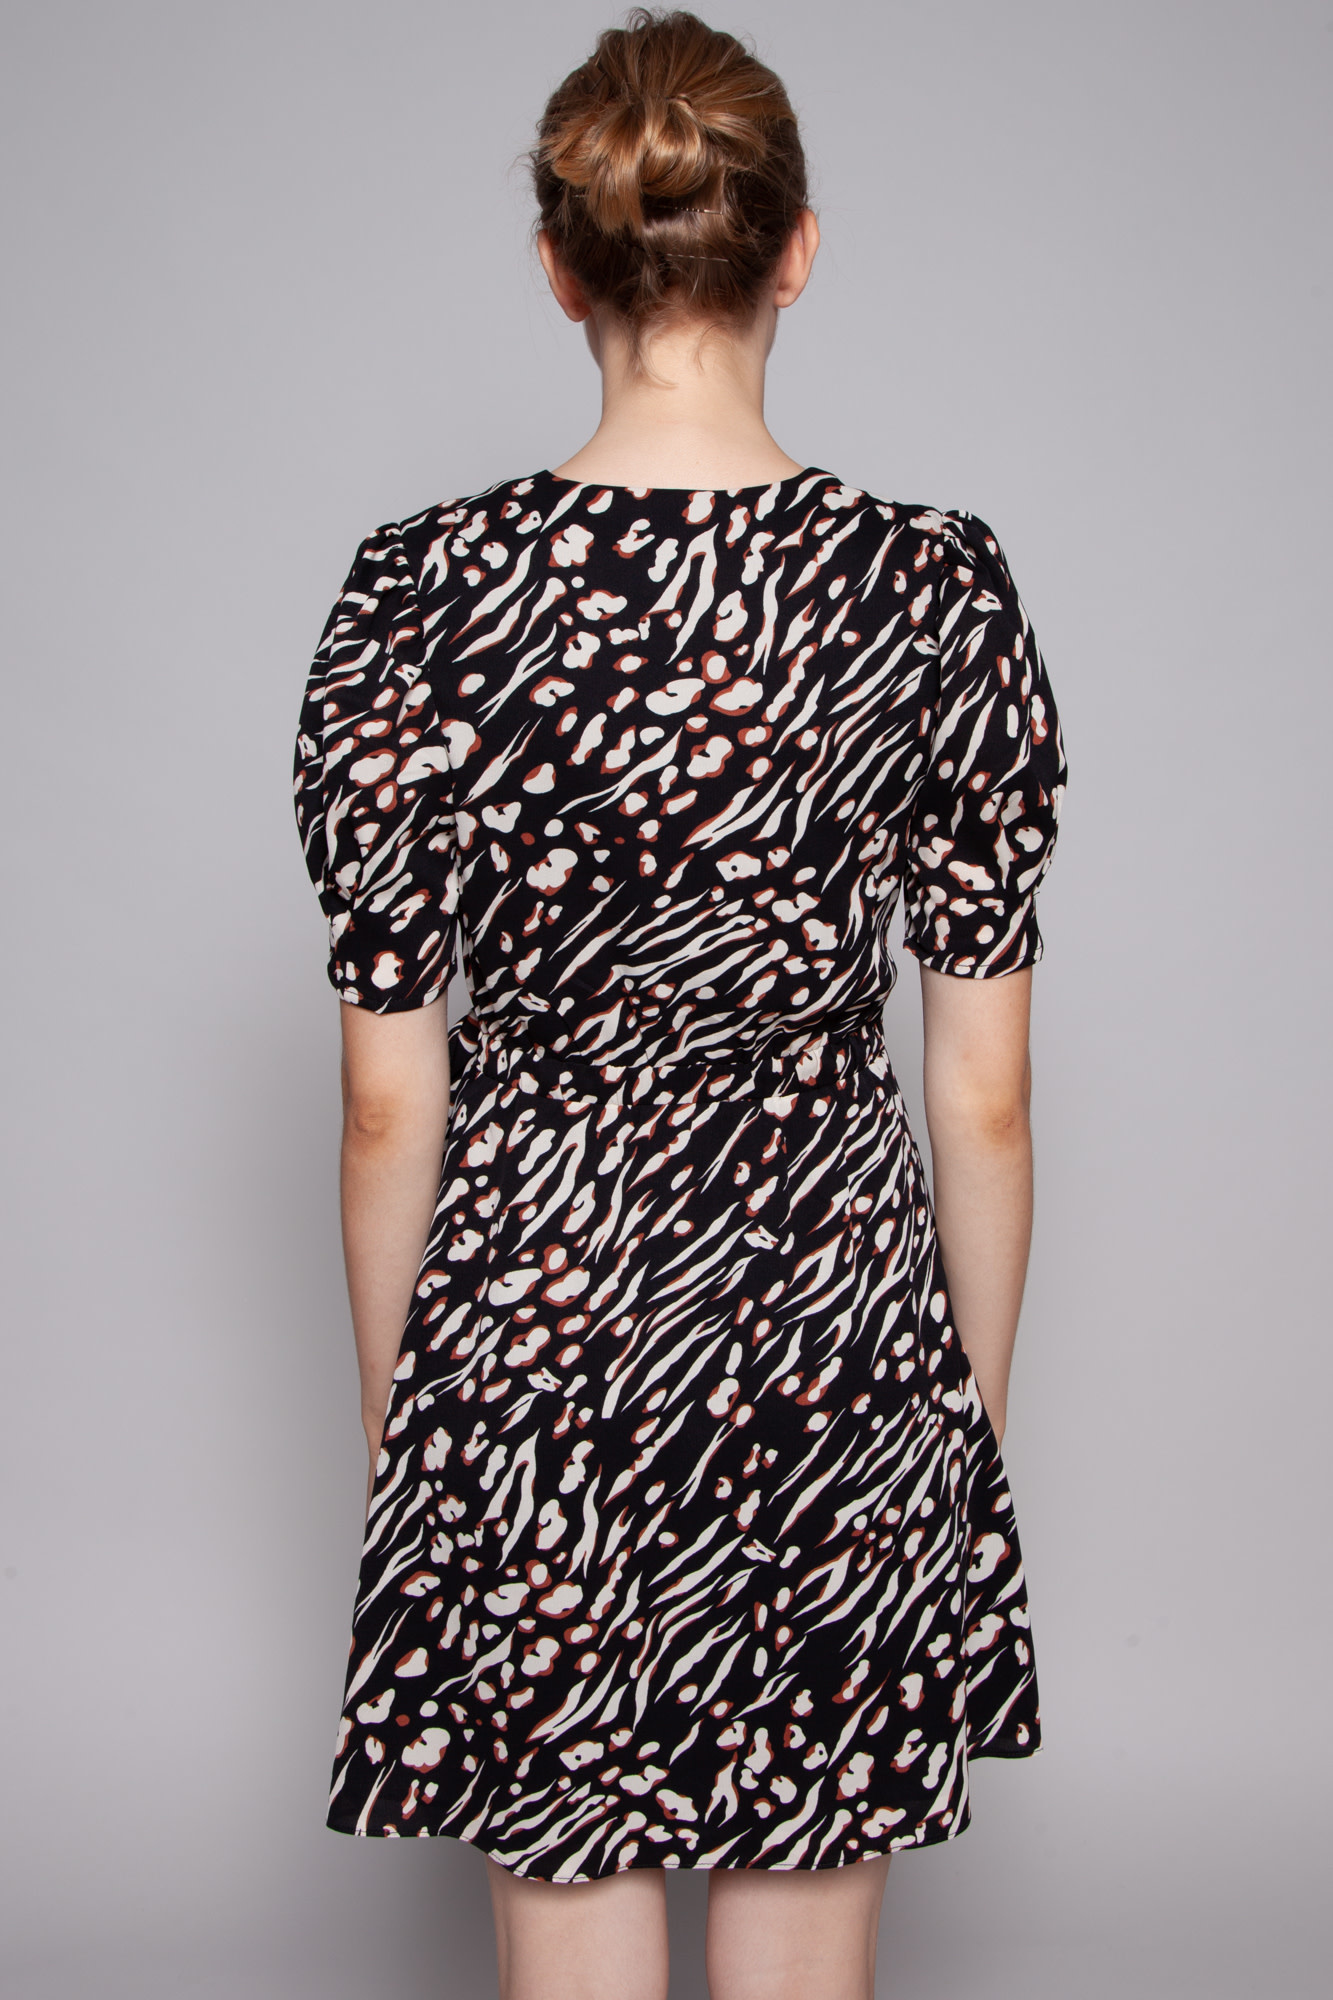 Heartloom TIGER PRINT WRAP DRESS - NEW